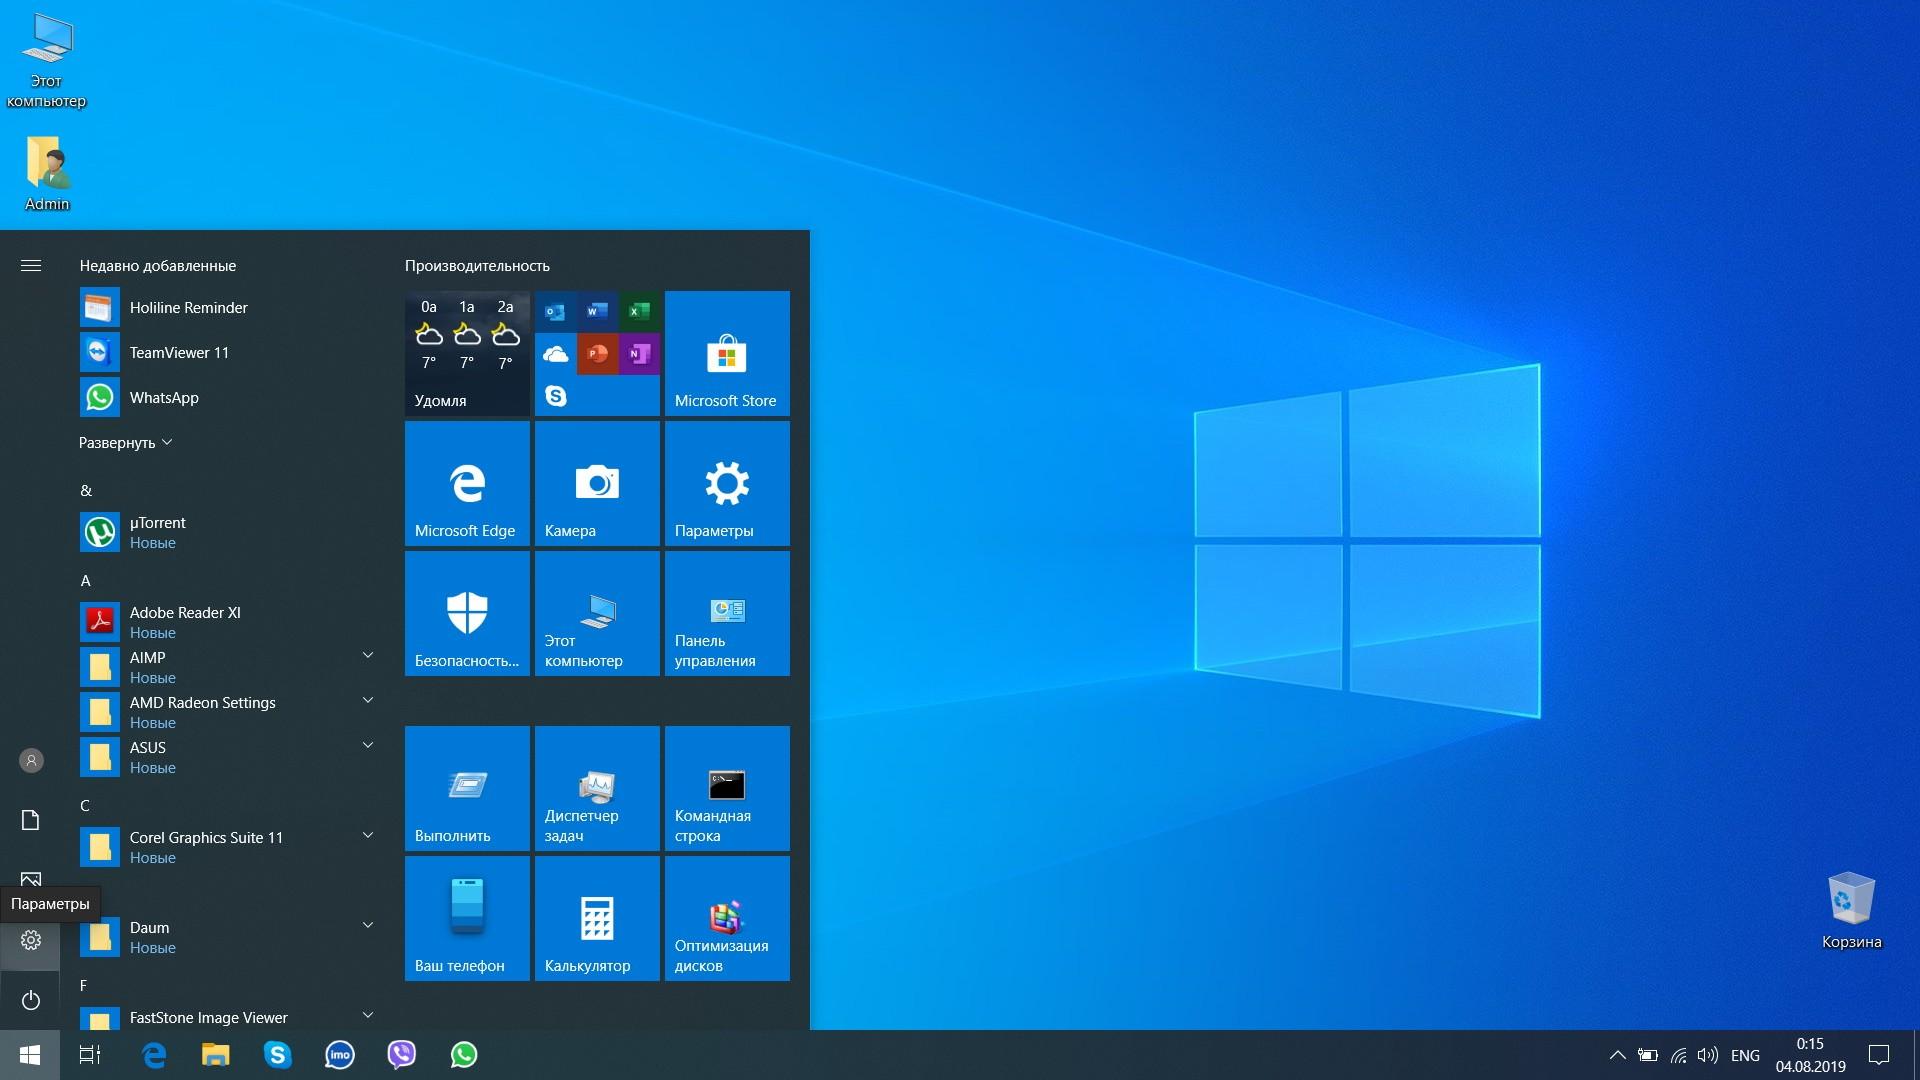 Windows 10 May 2019 Update (версия 1903)